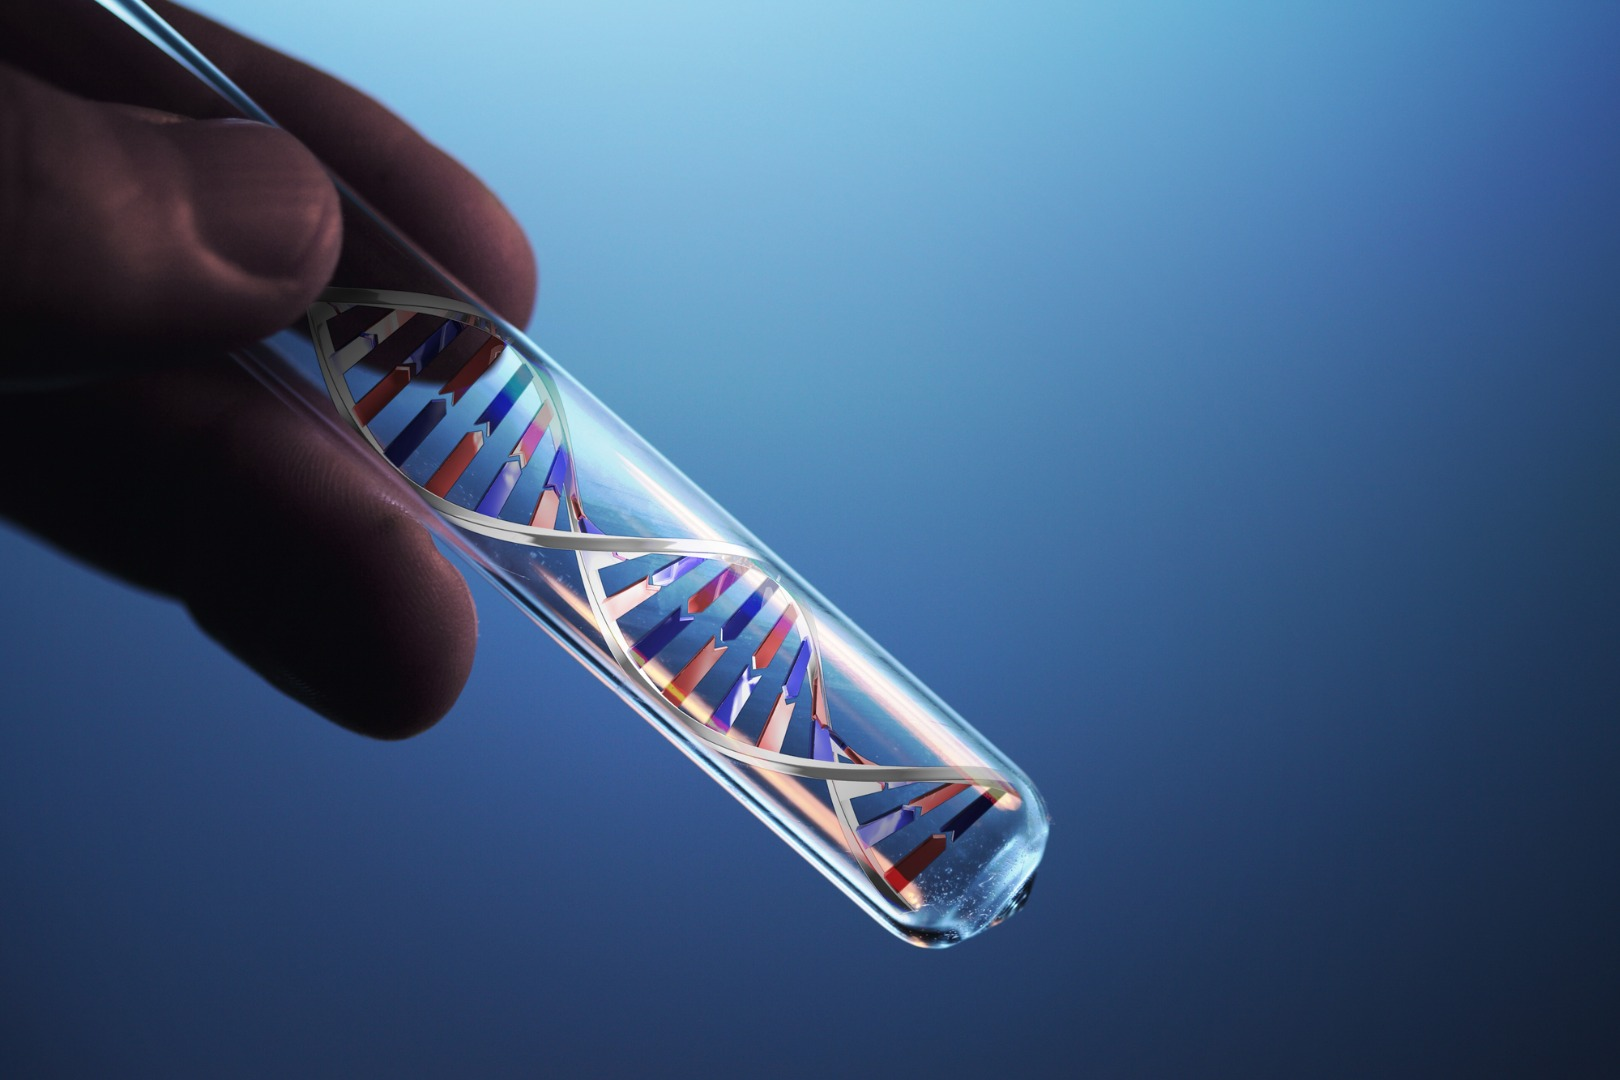 CRISPR-Cas9 gene-editing tool used in first human trial